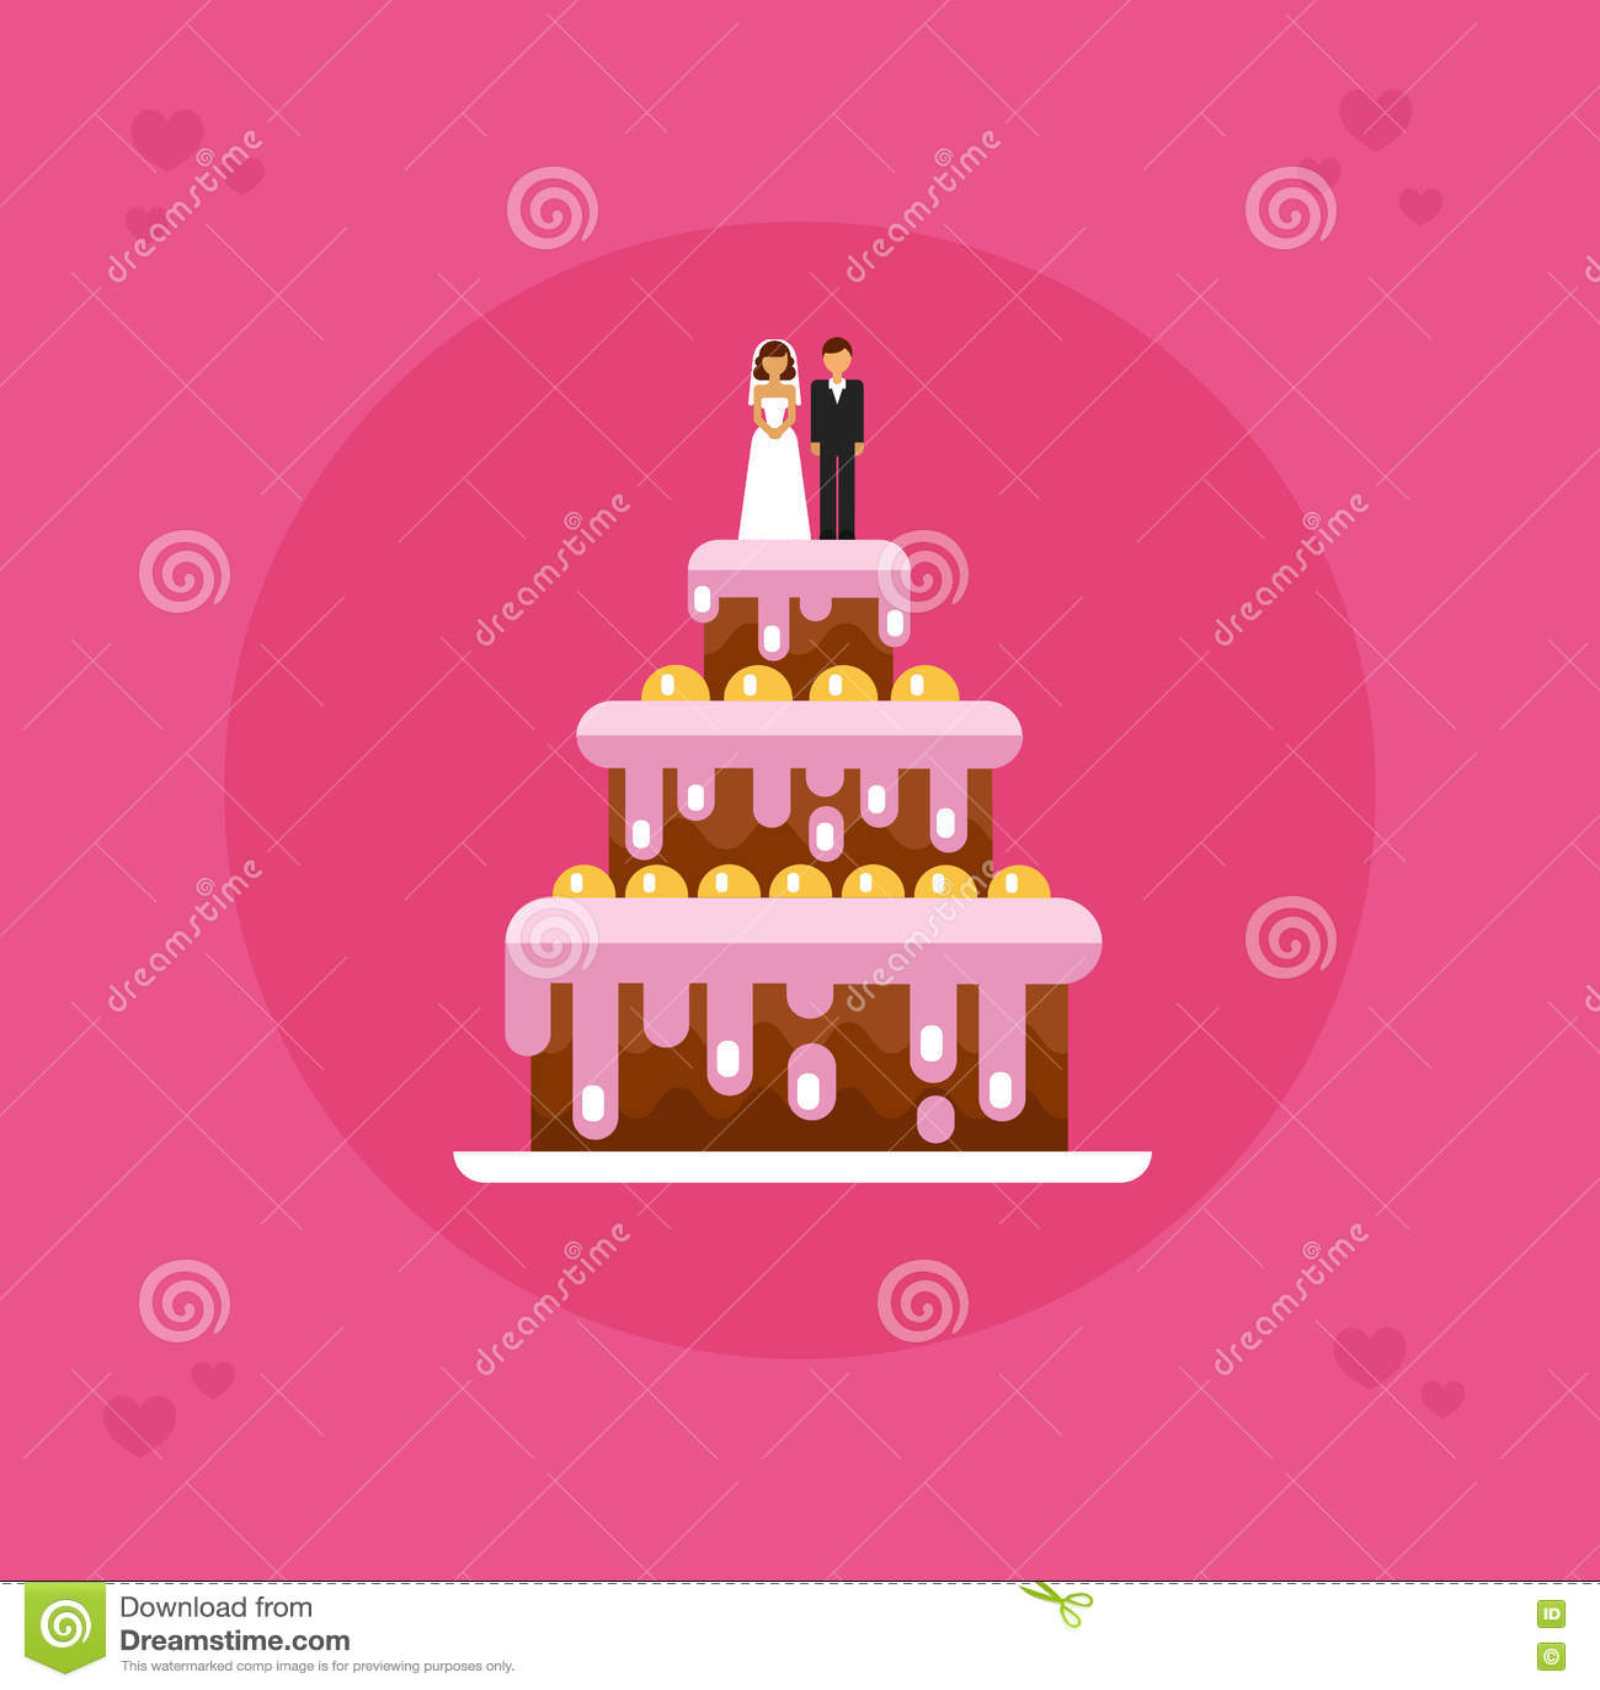 Wedding cake stock vector. Illustration of gift, decoration - 78207593